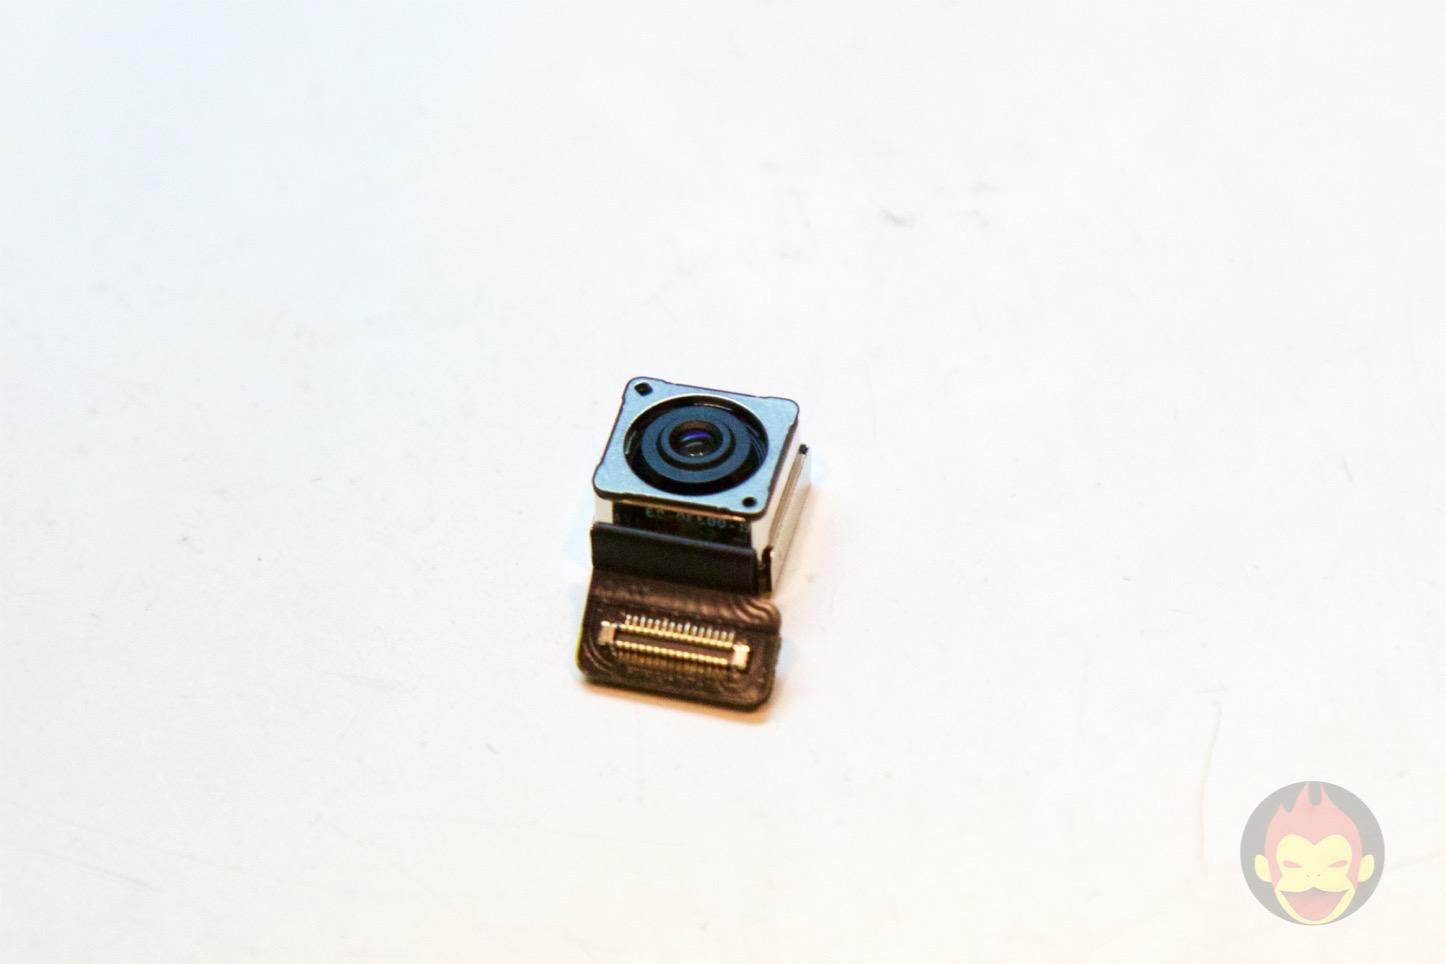 iPhone-SE-decompose-15.jpg